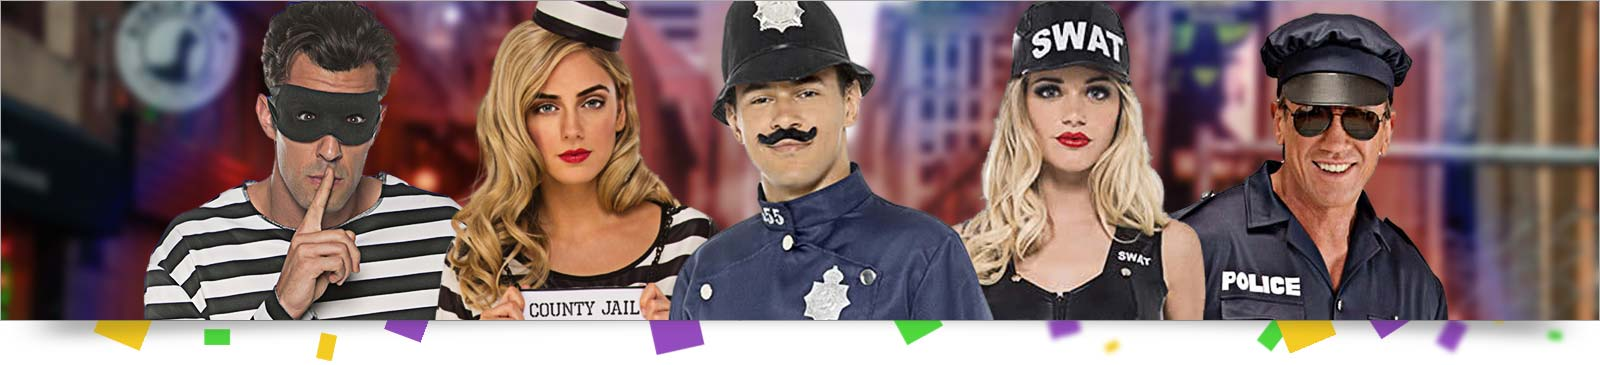 Polizei Kostüm & Gangster Kostüm